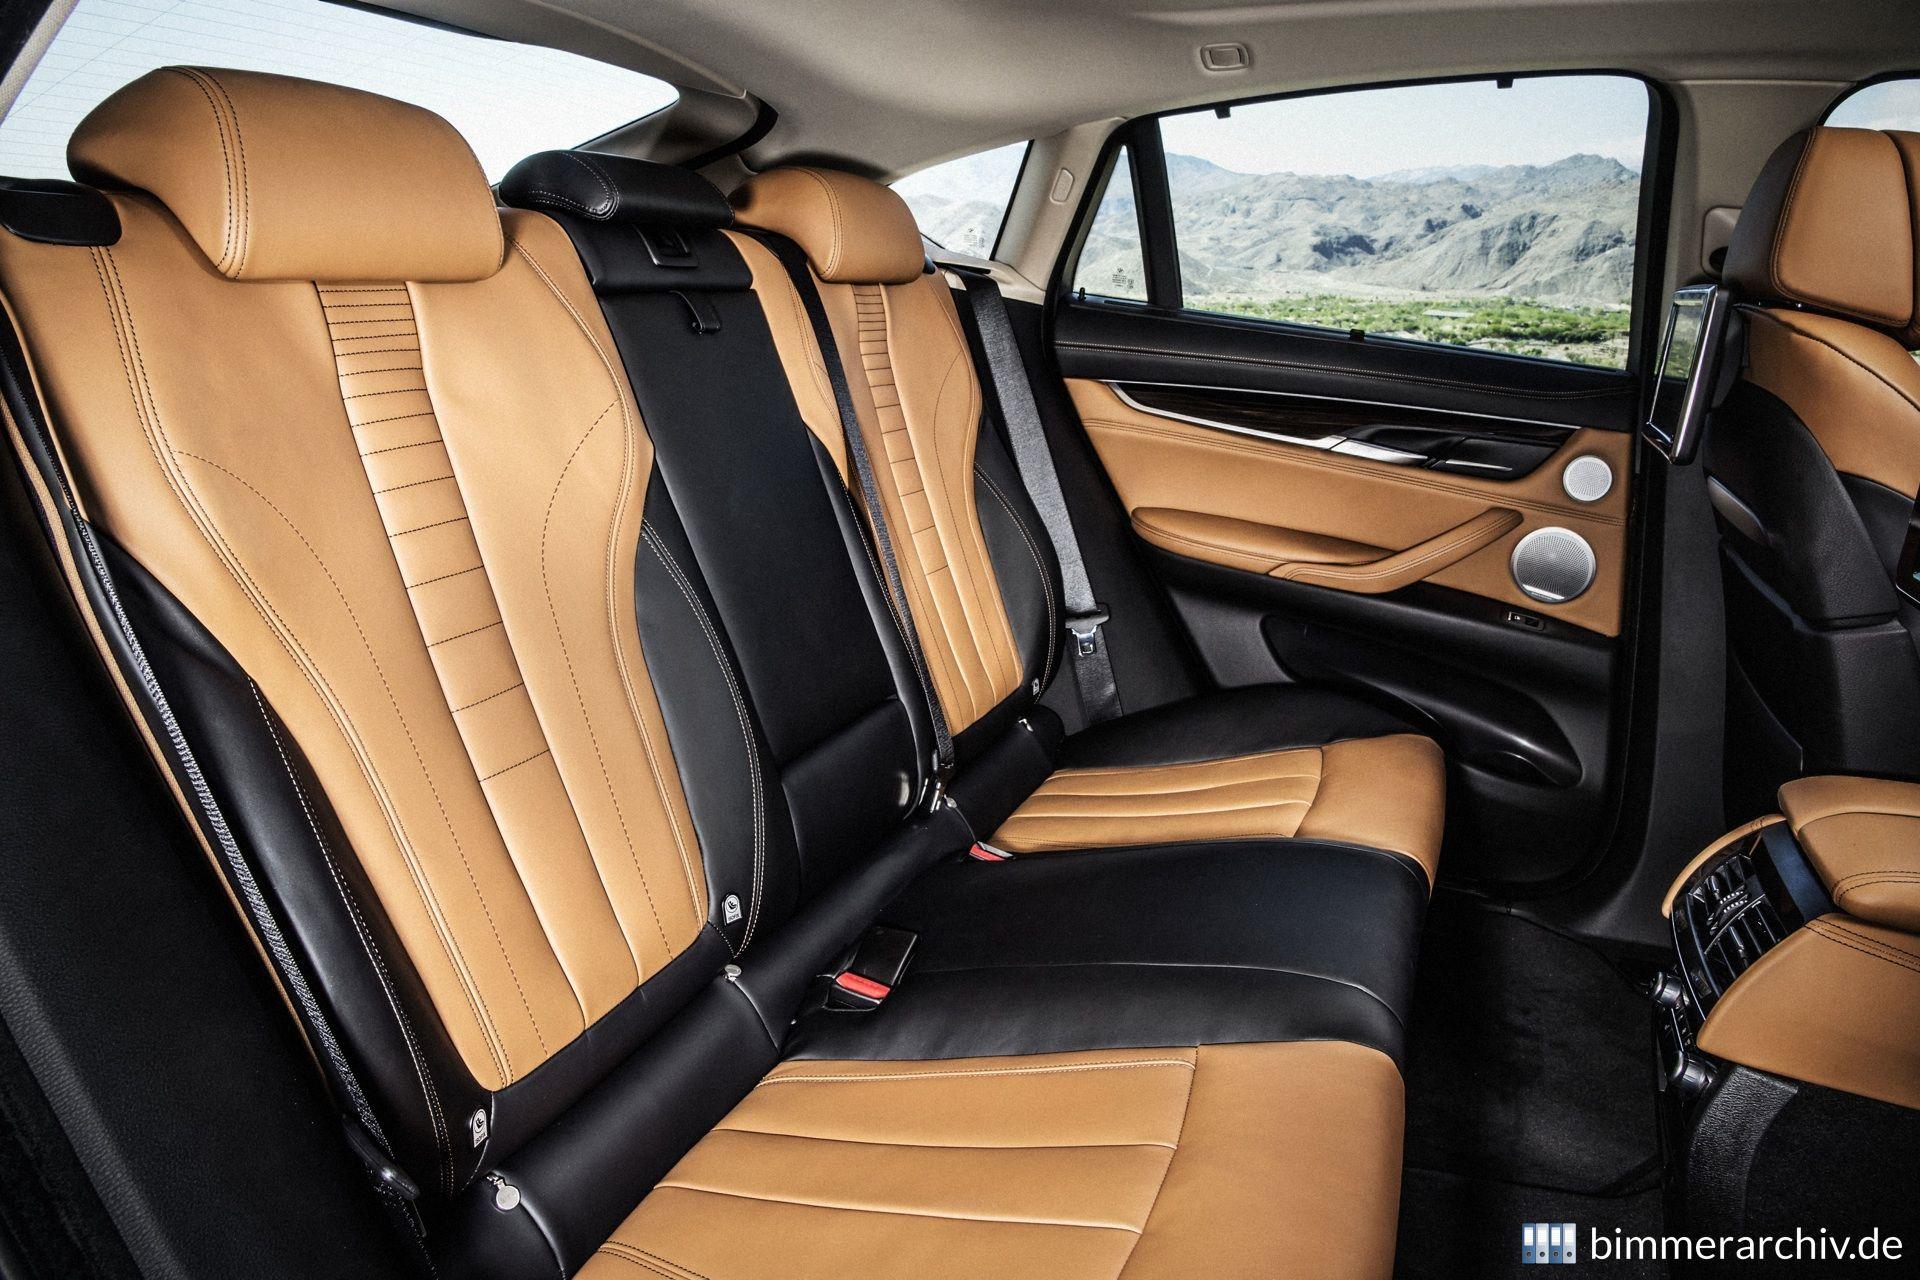 Model Archive For Bmw Models Bmw X6 Xdrive50i Interior Design